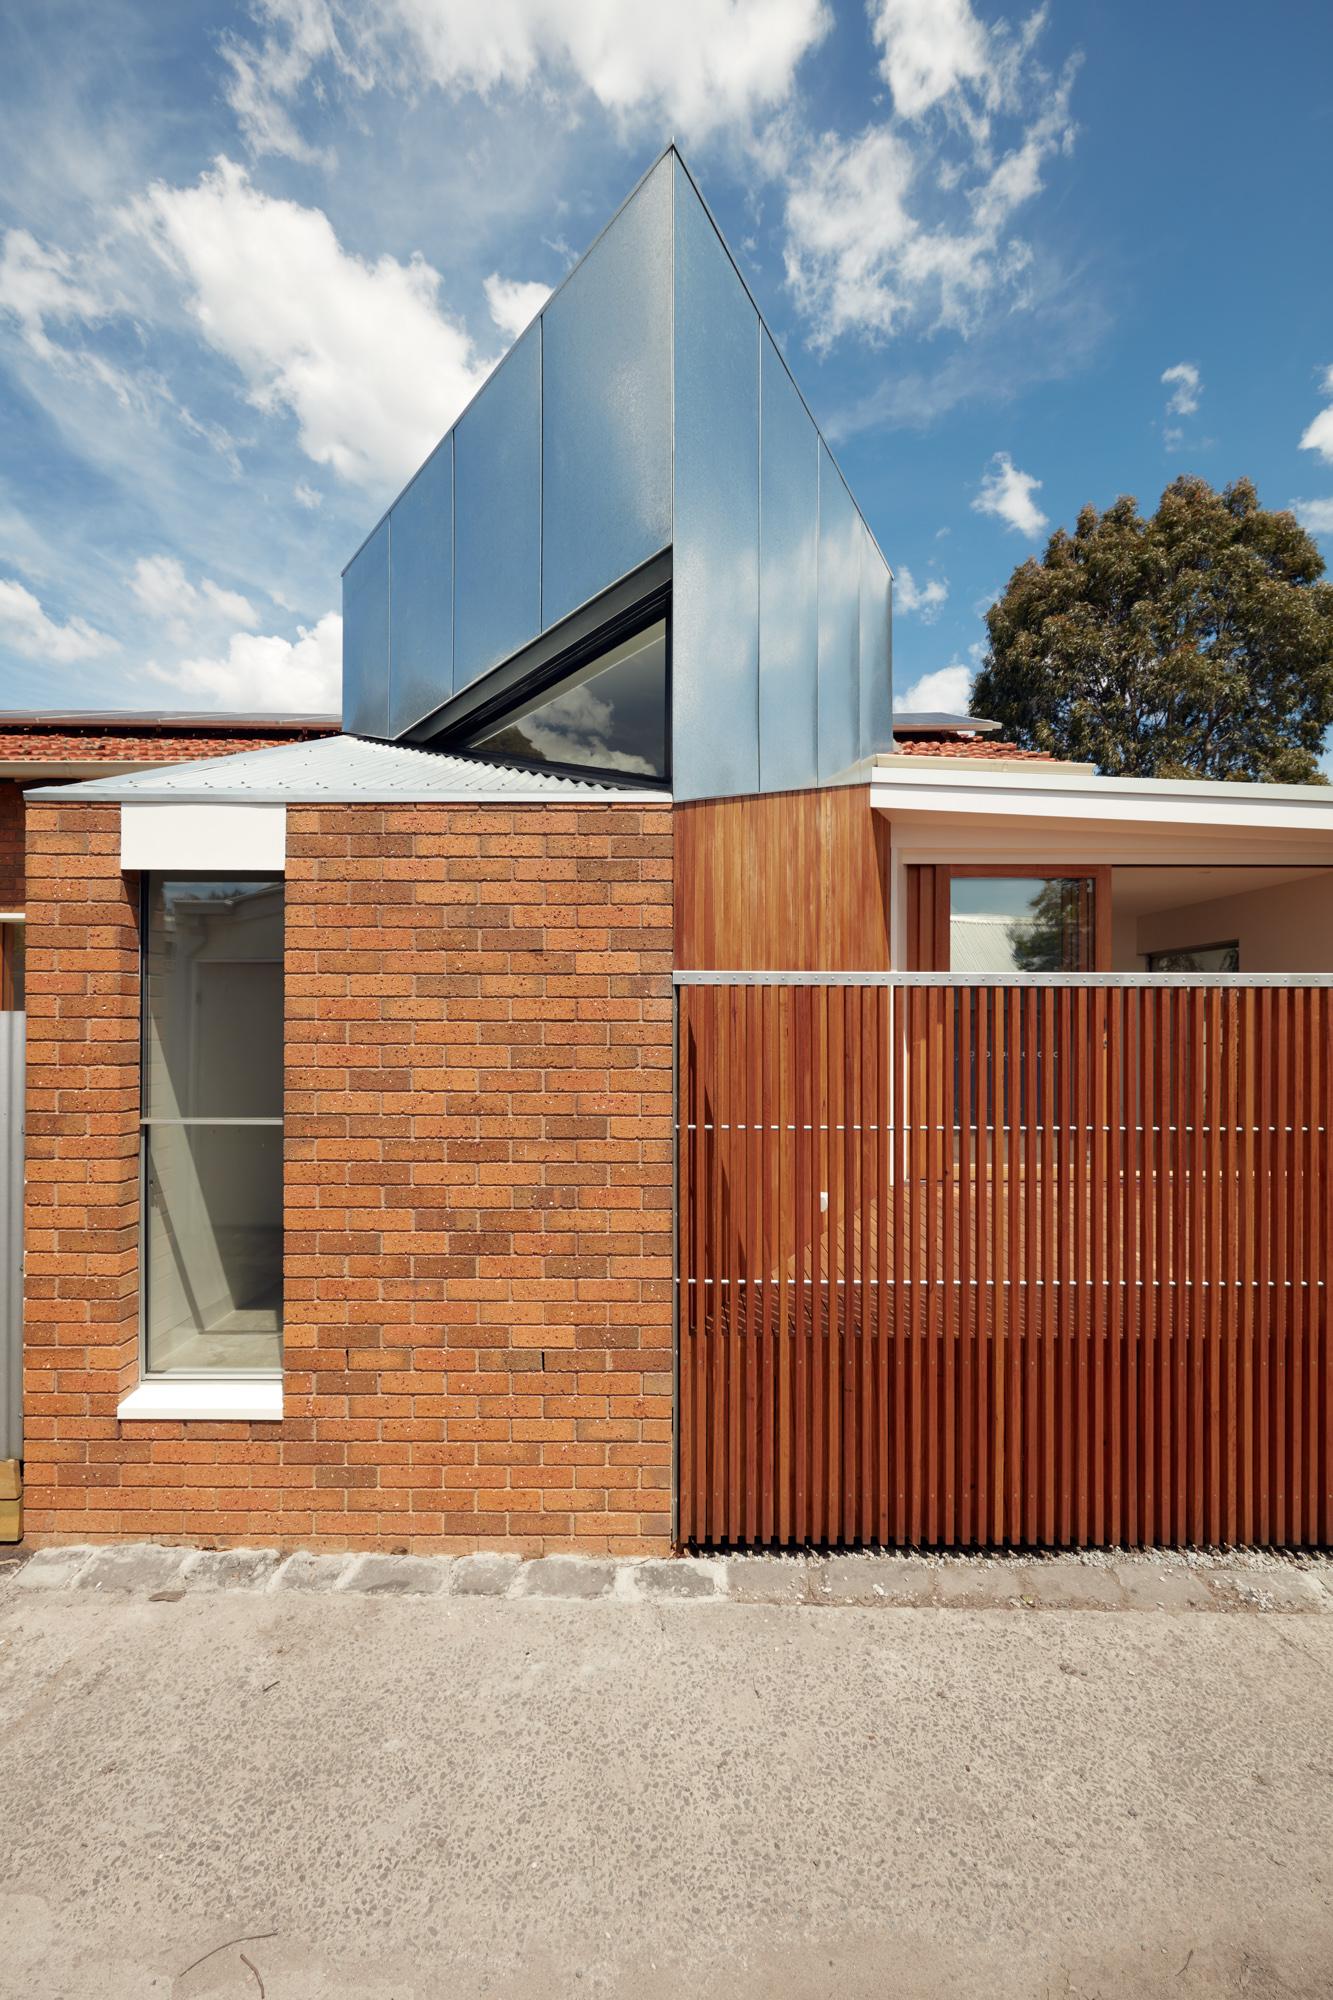 Gallery Of The Taranaki Rift By Architecture Architecture Local Australian Bespoke Innovative Residential Brunswick, Melbourne Image 14